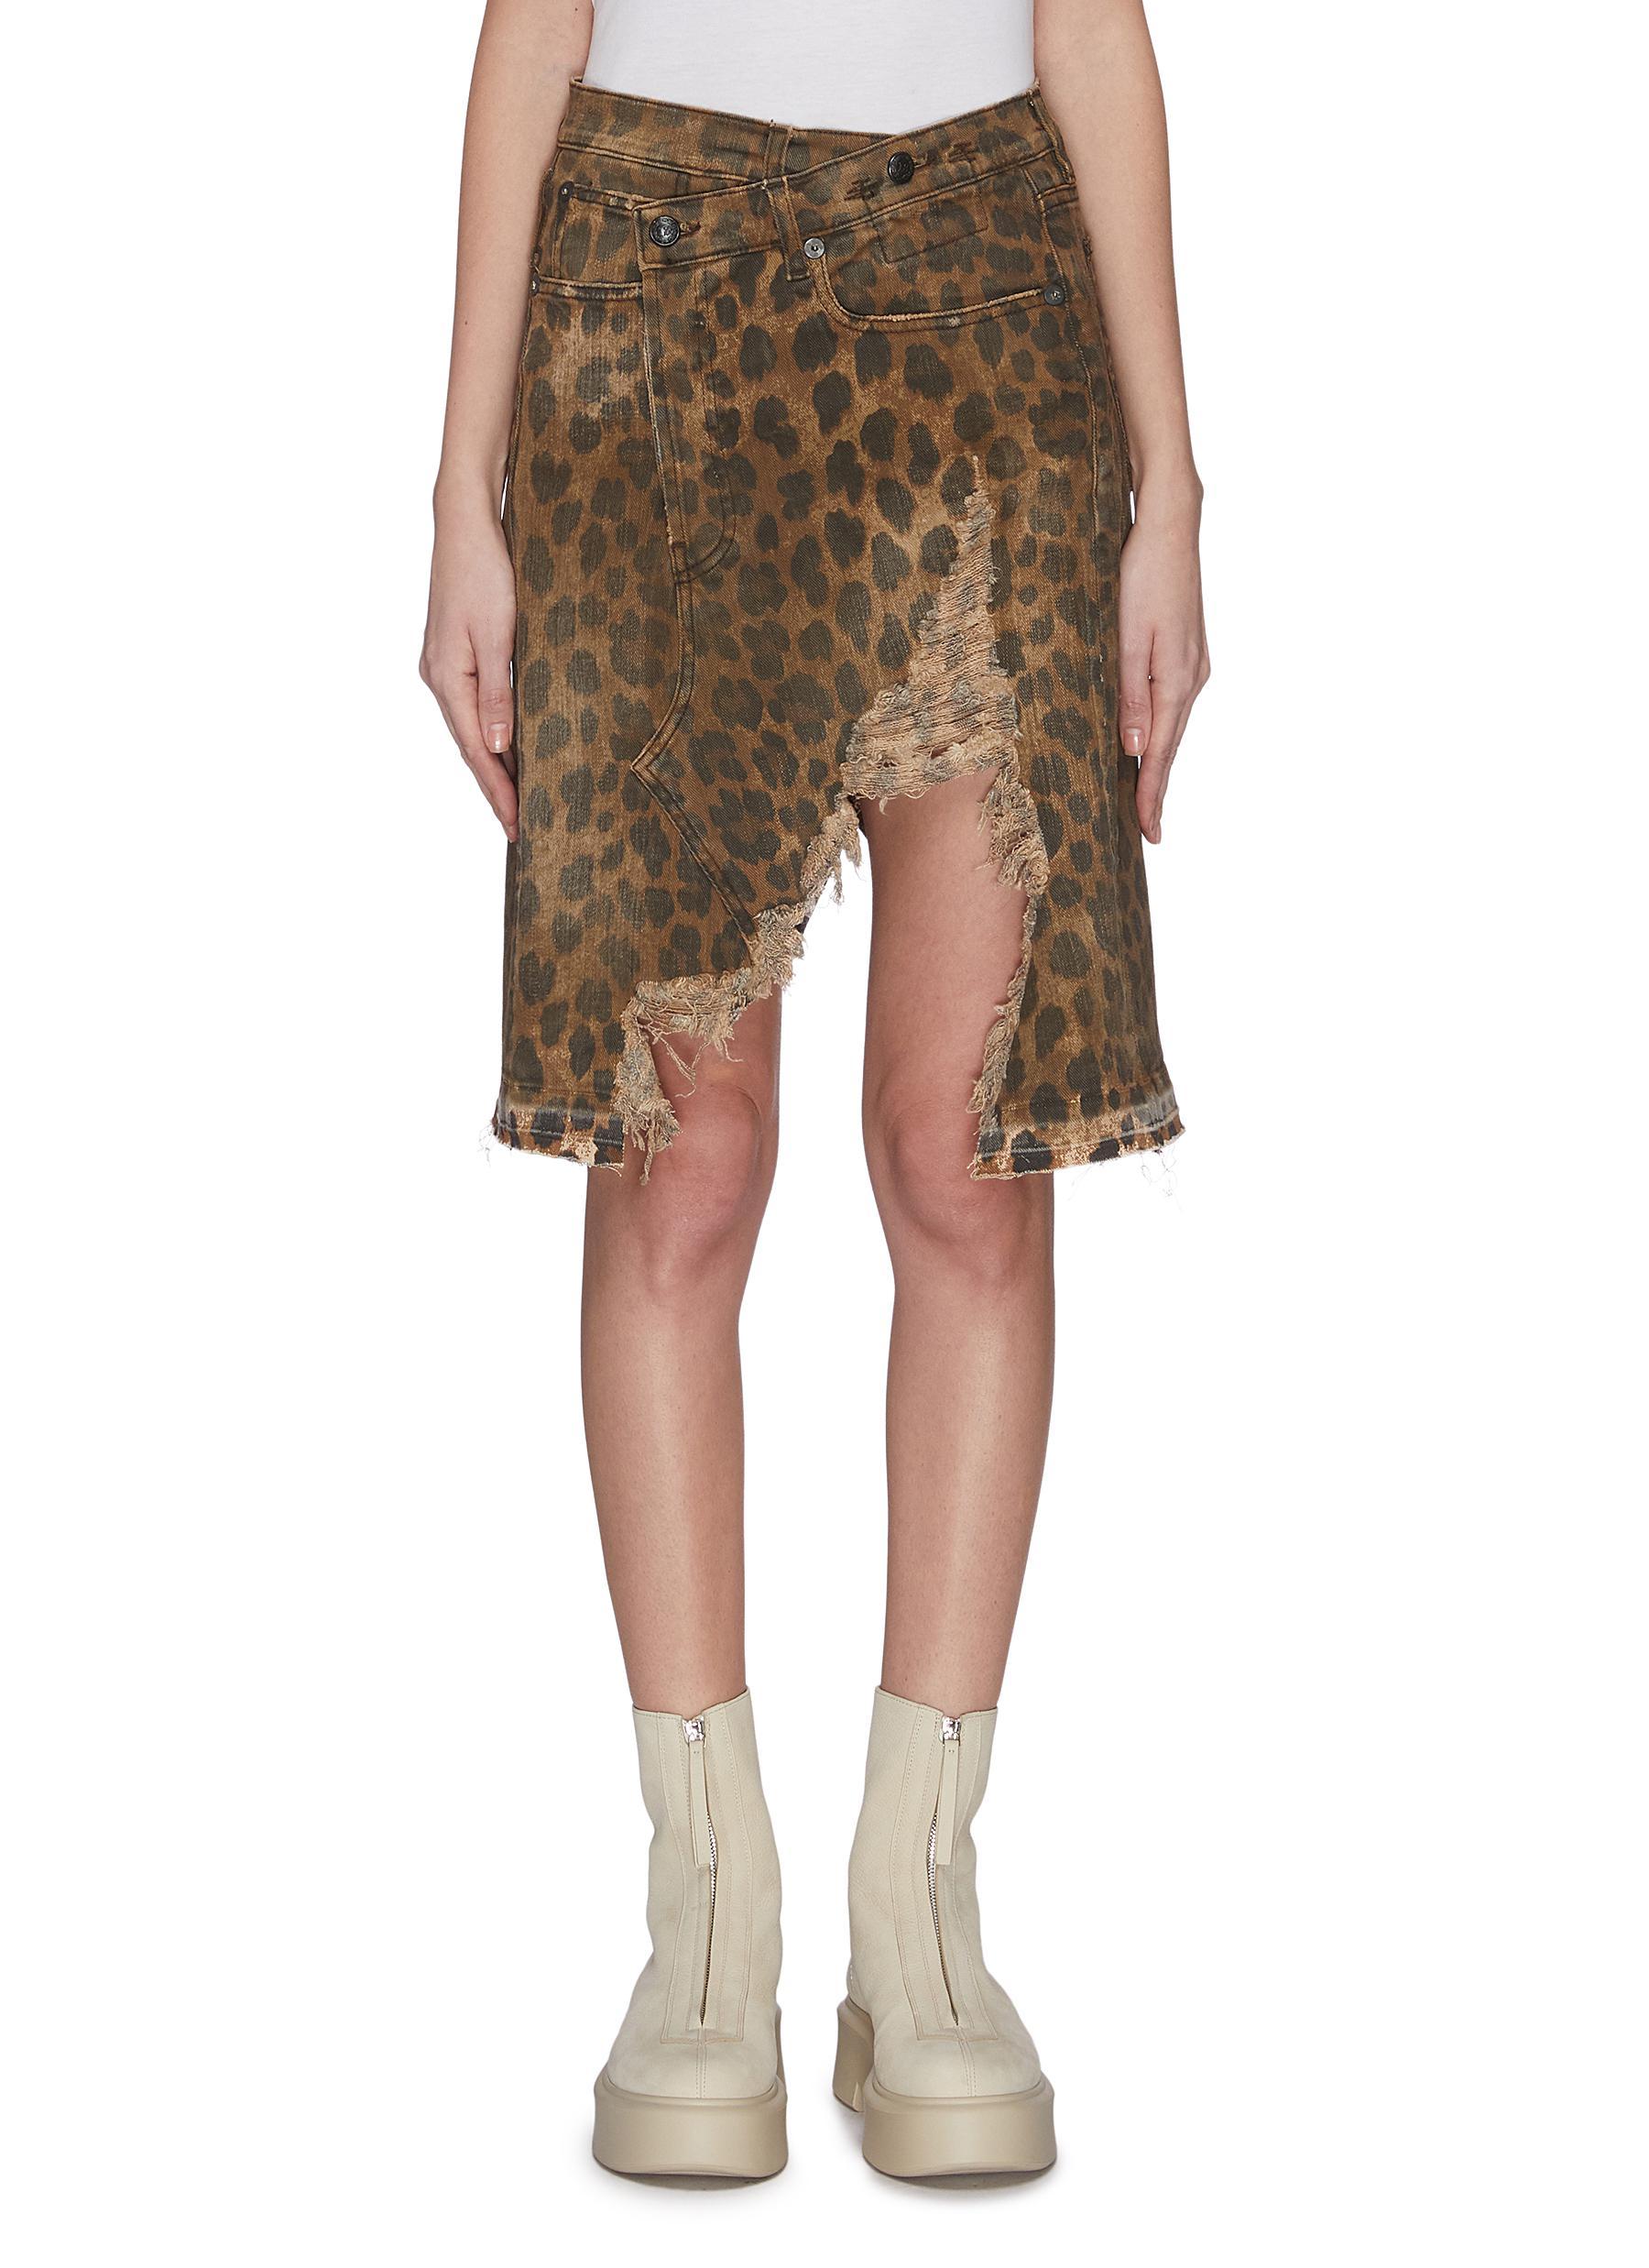 Buy R13 Skirts 'Norbury' leopard print split hem denim skirt